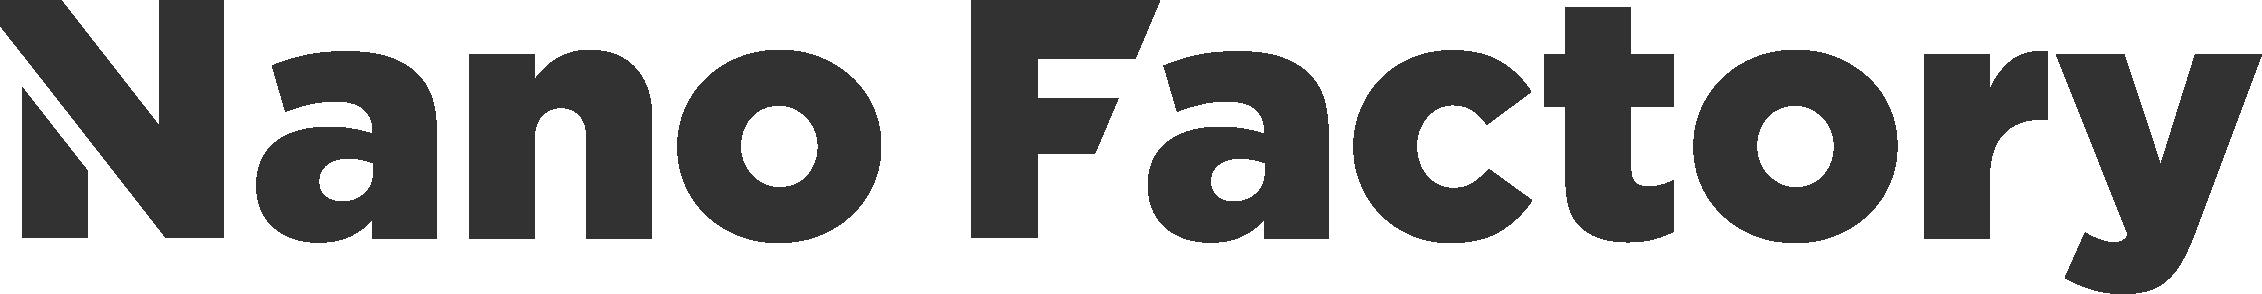 NanoFactory-logo-black_2